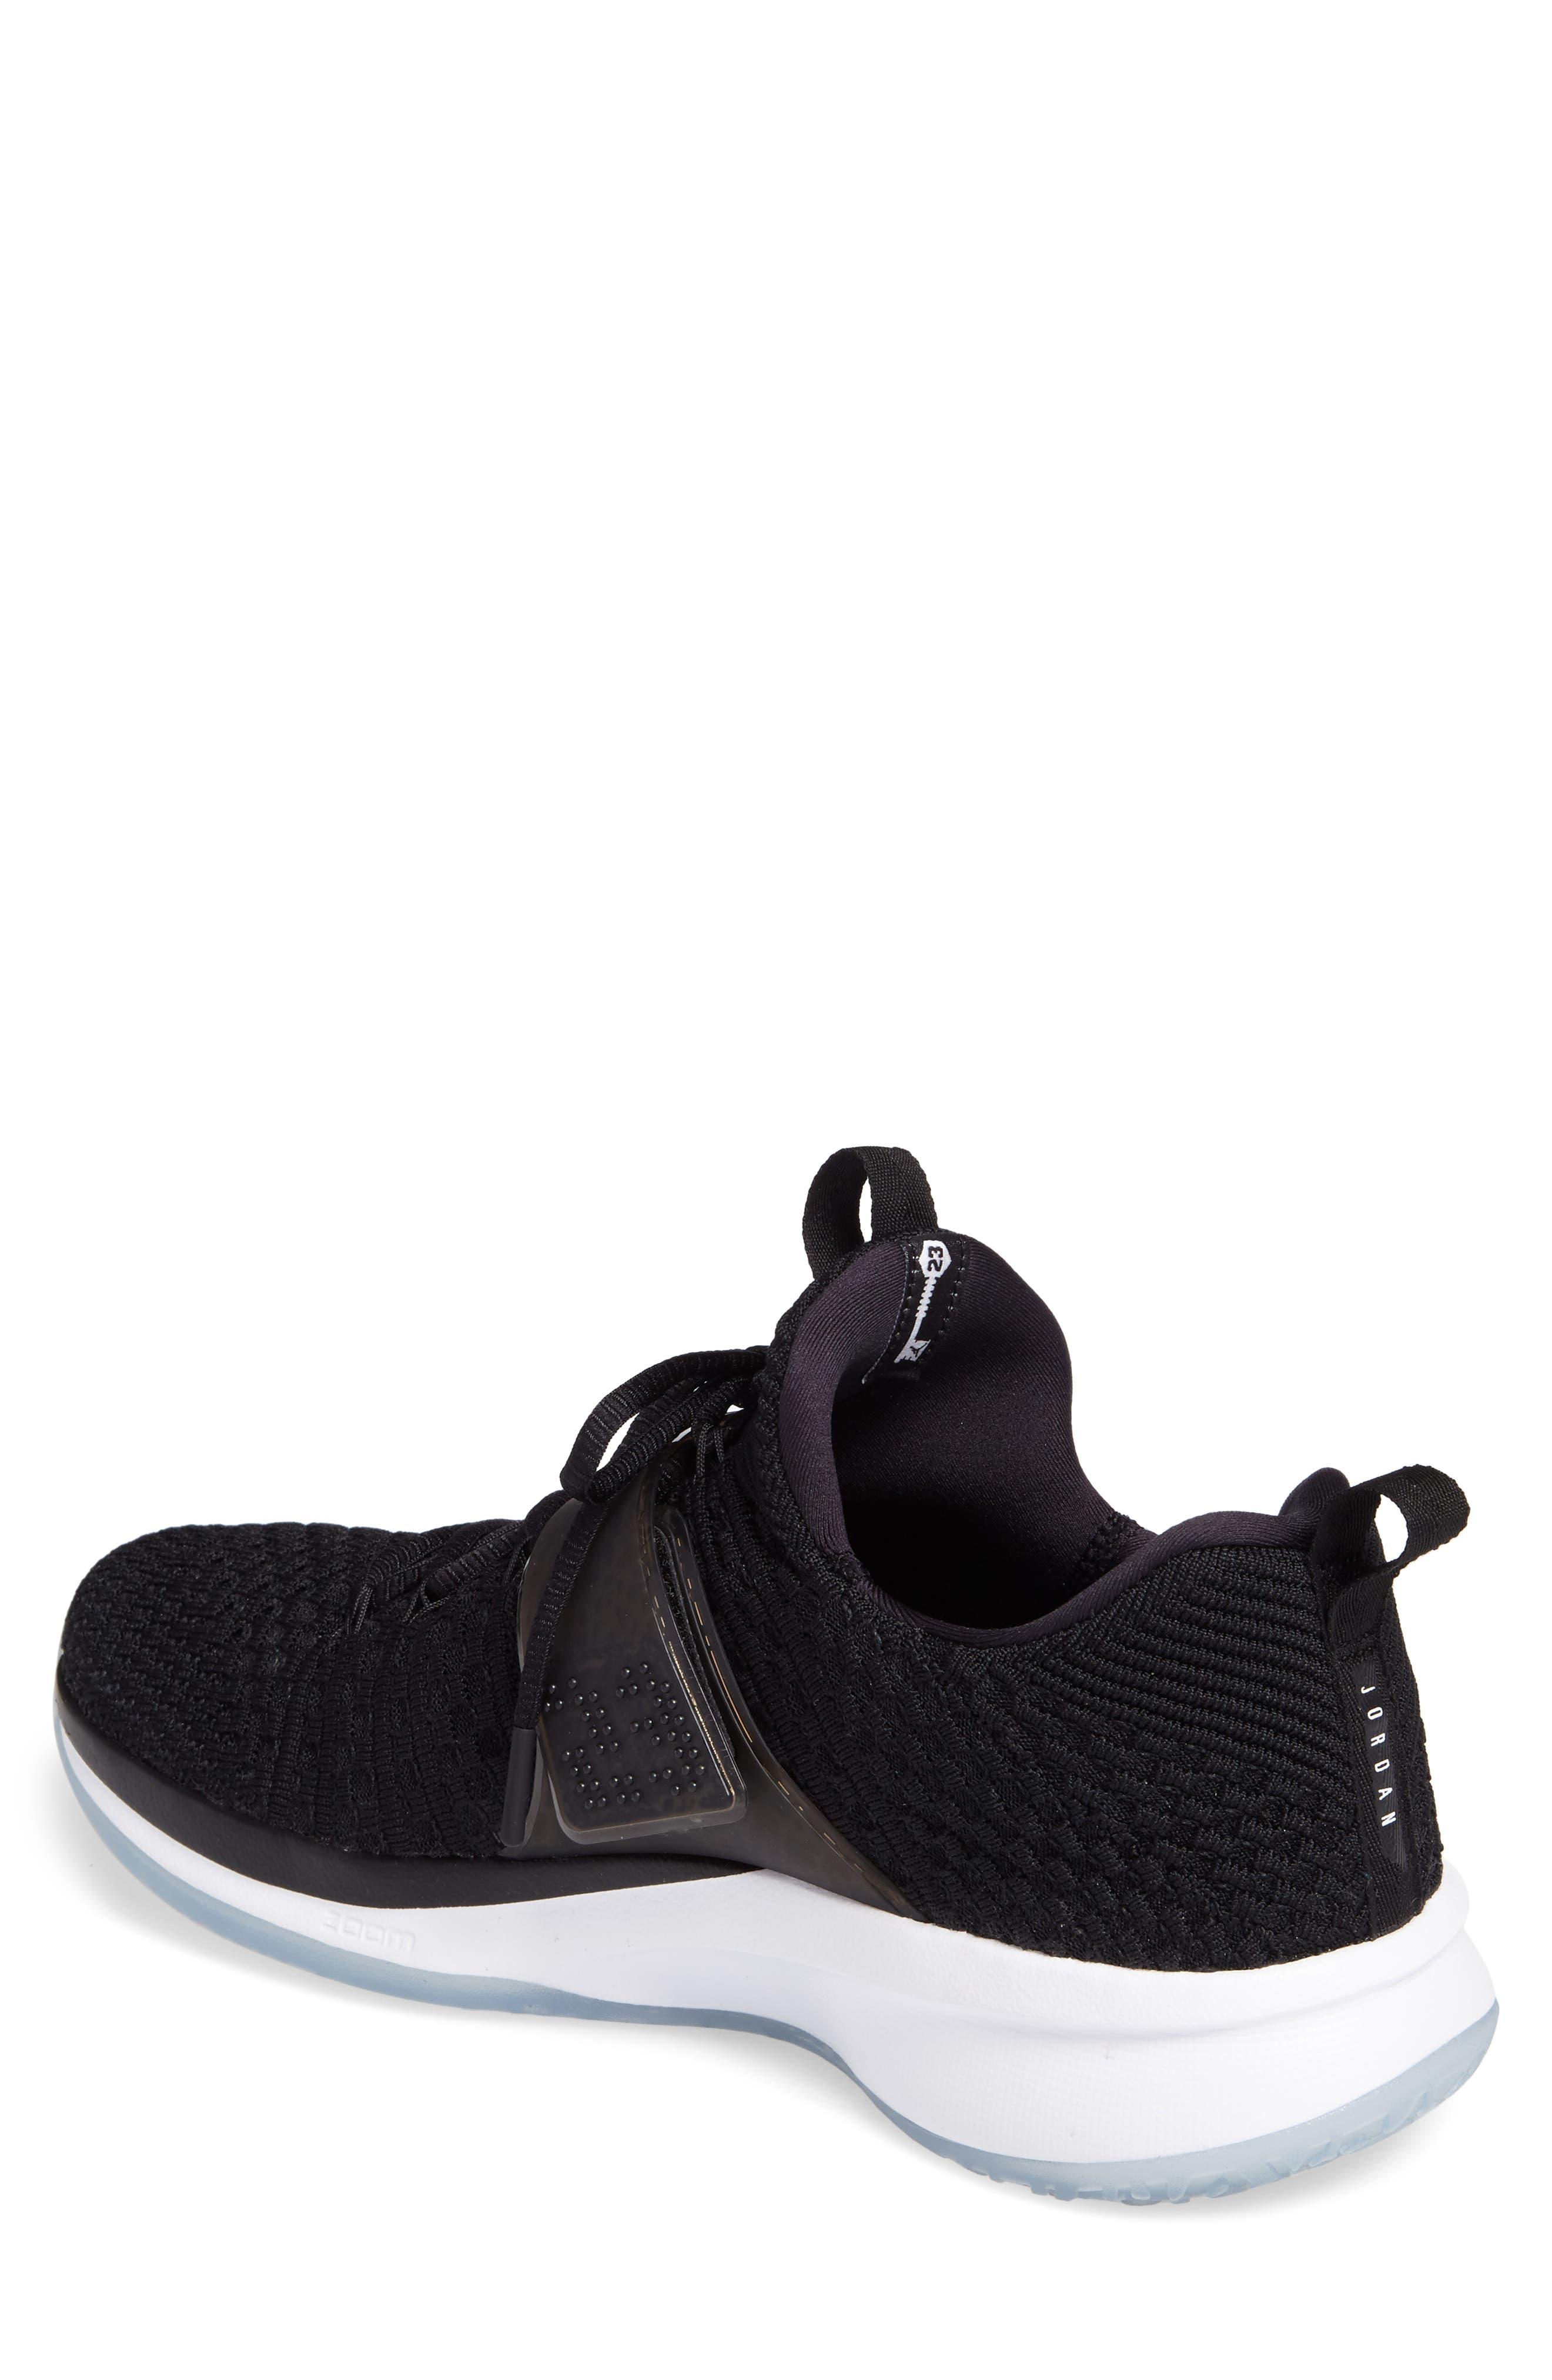 Jordan Flyknit Trainer 2 Low Sneaker,                             Alternate thumbnail 6, color,